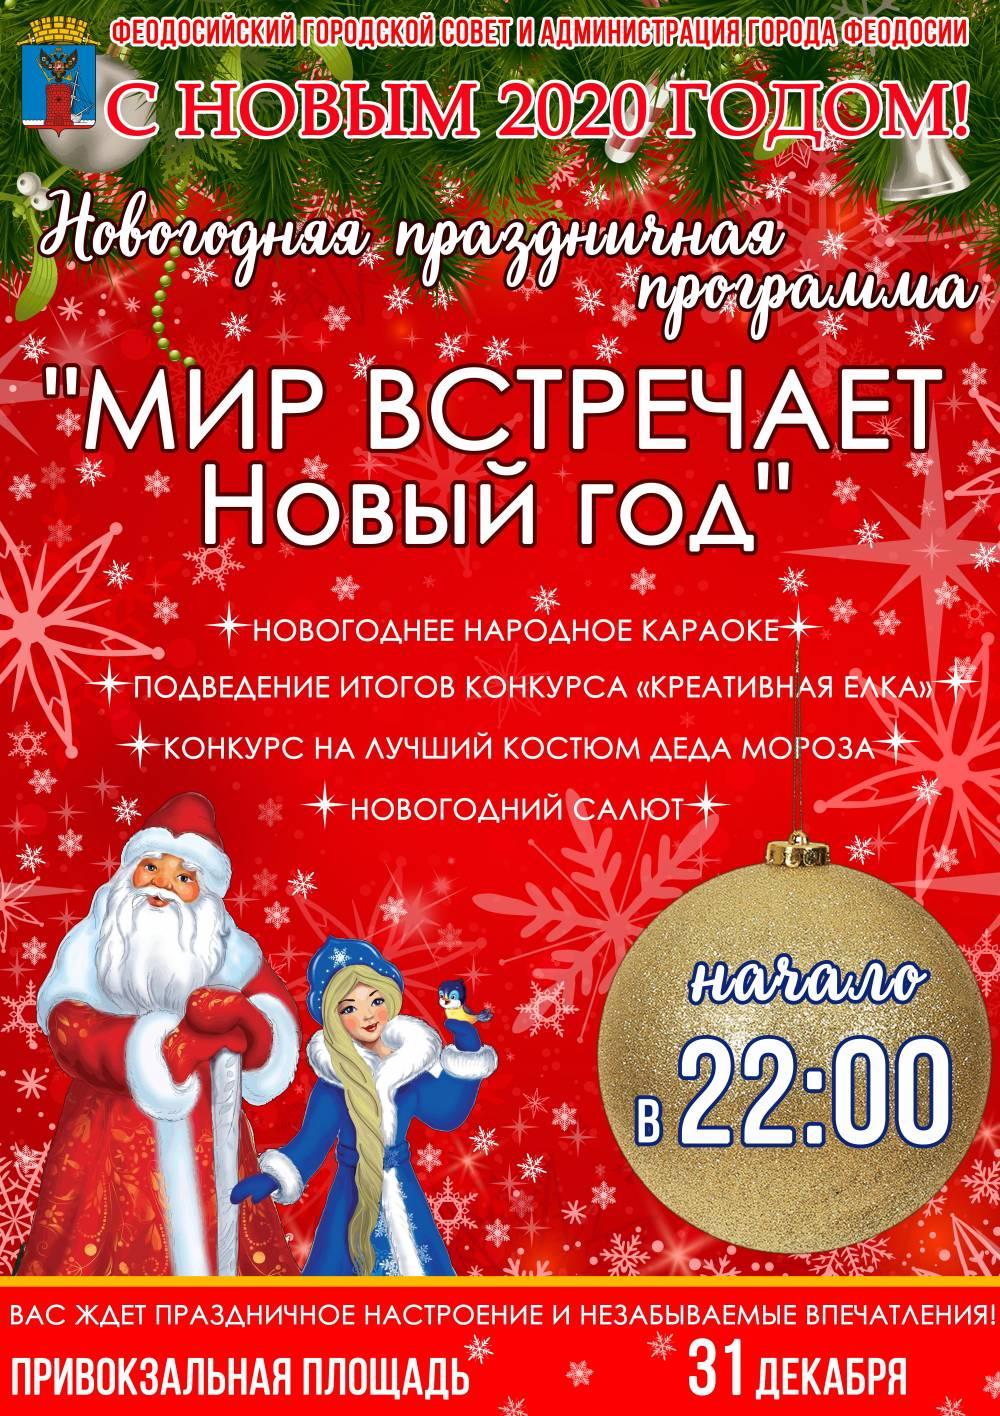 Новогодняя программа от Феодосийского Дома культуры